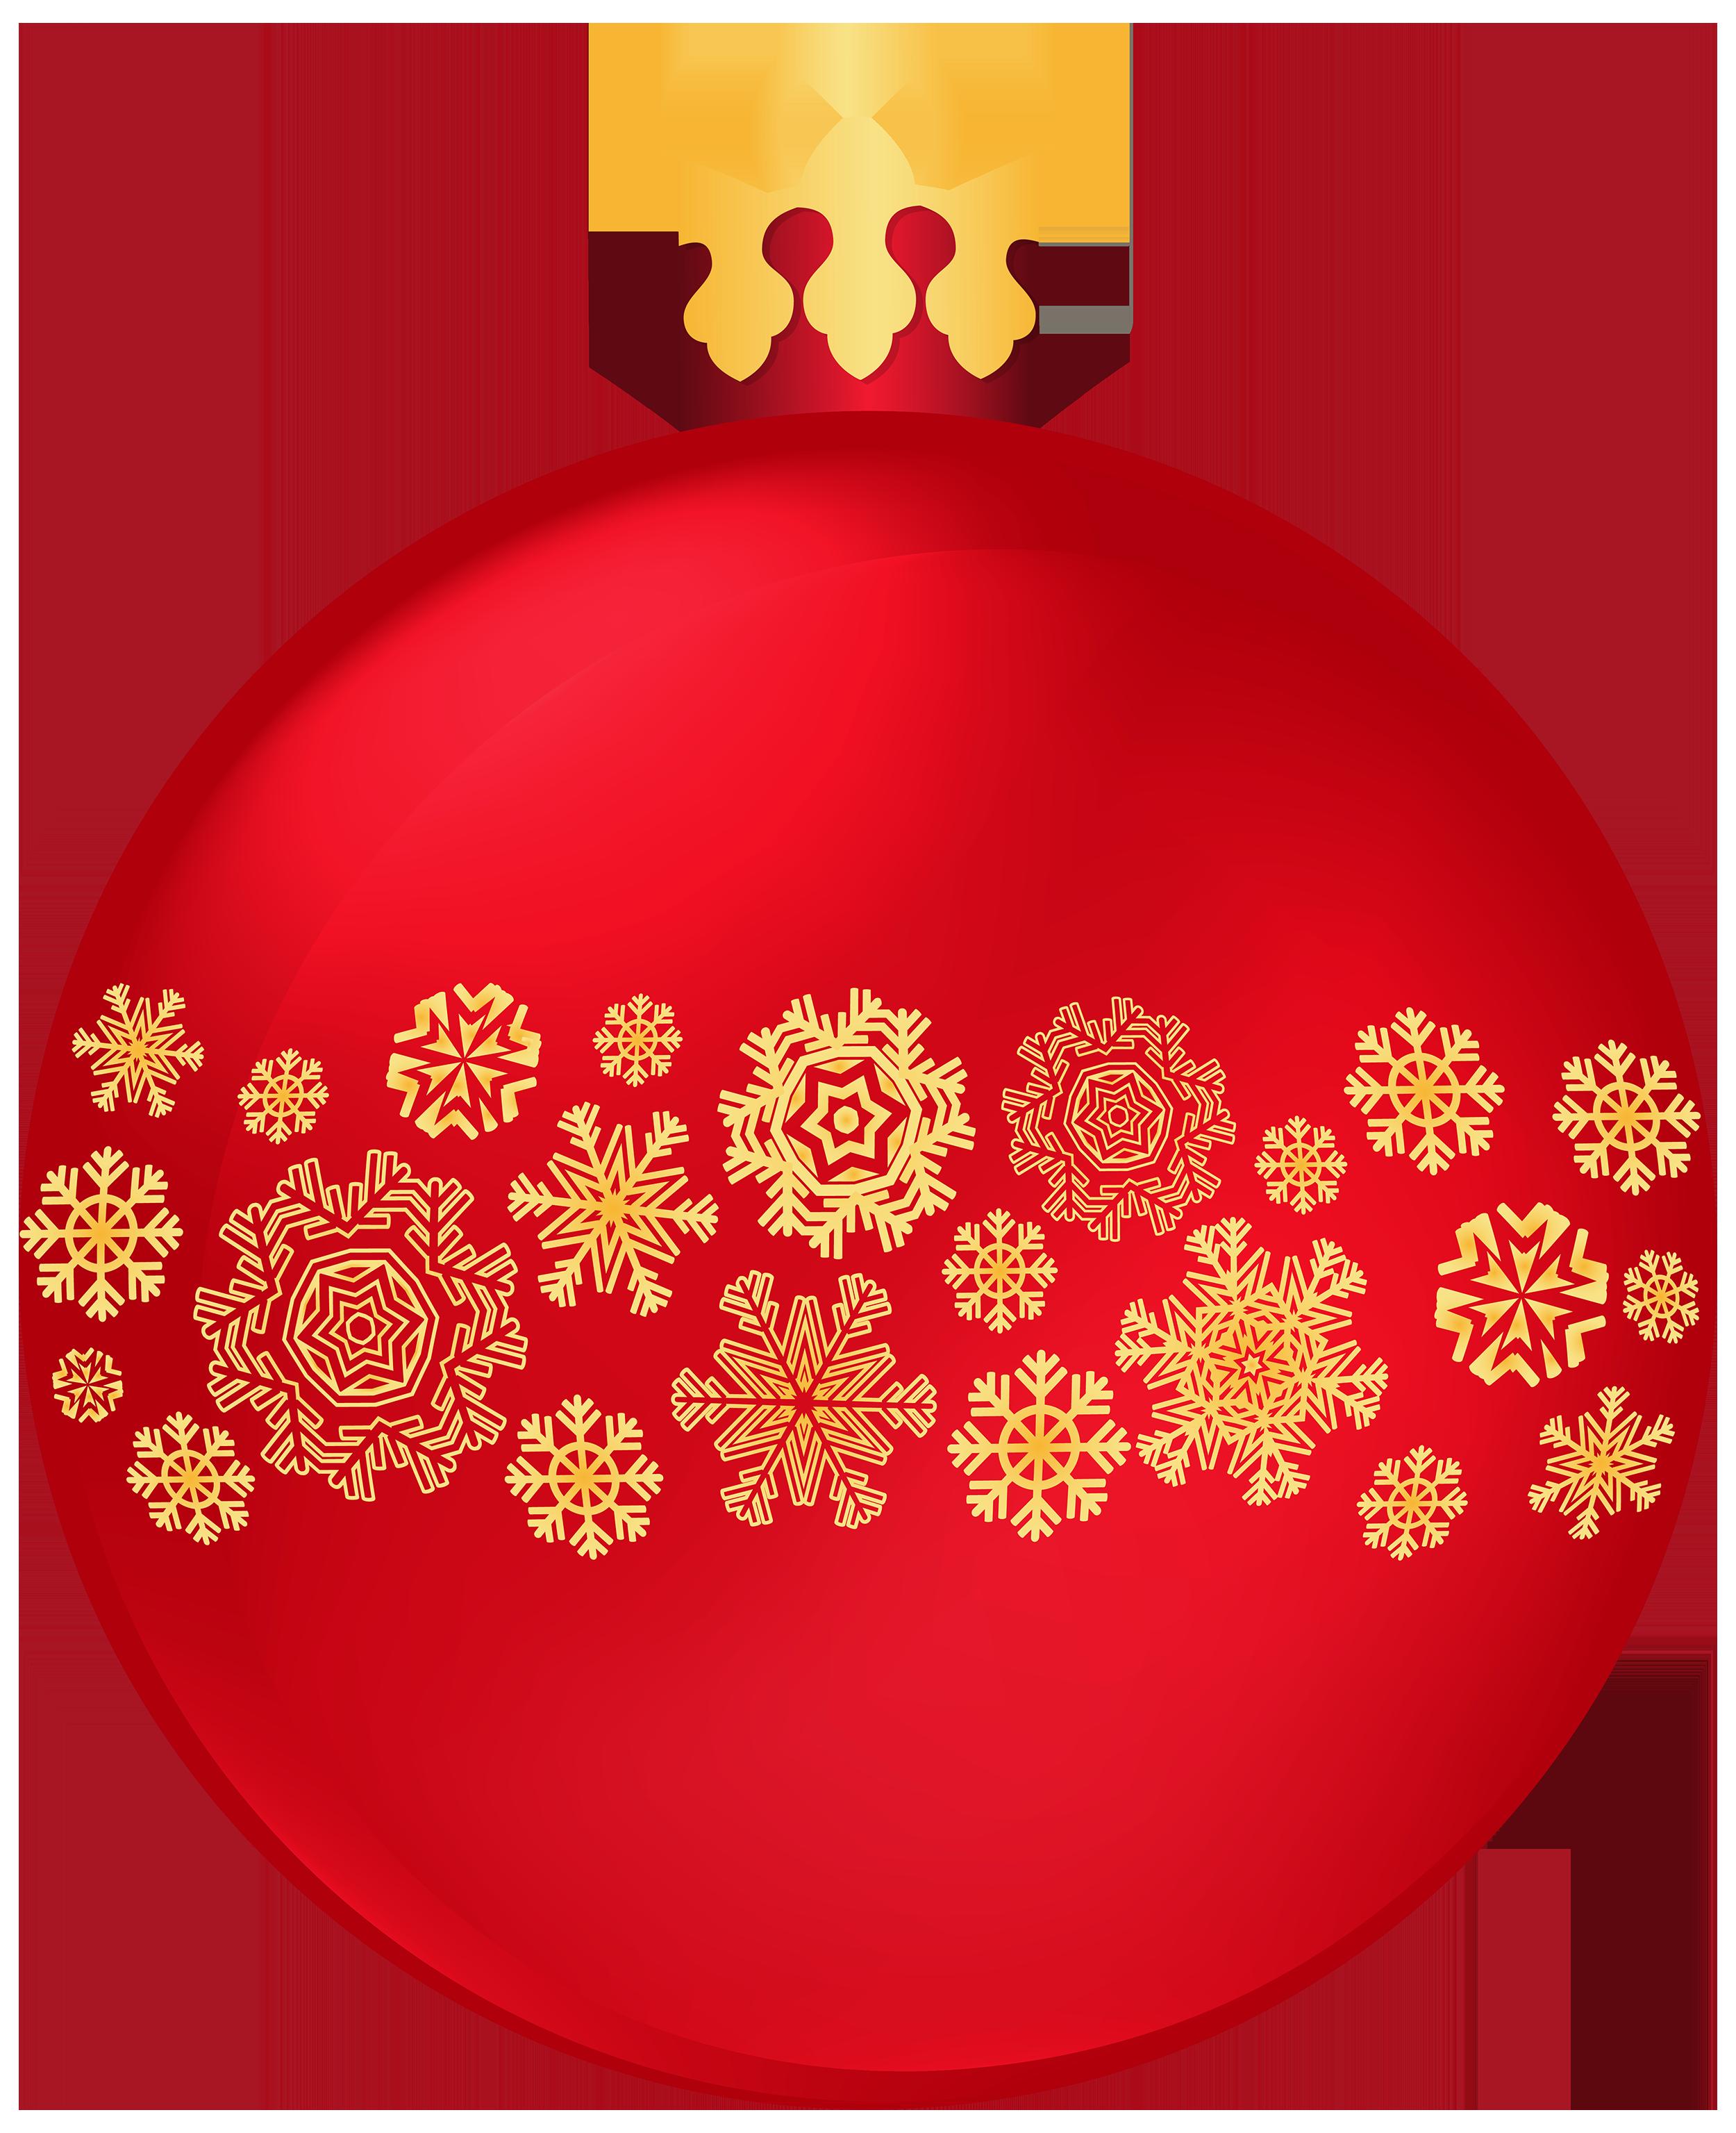 Christmas Balls Clipart Images - ClipartXtras